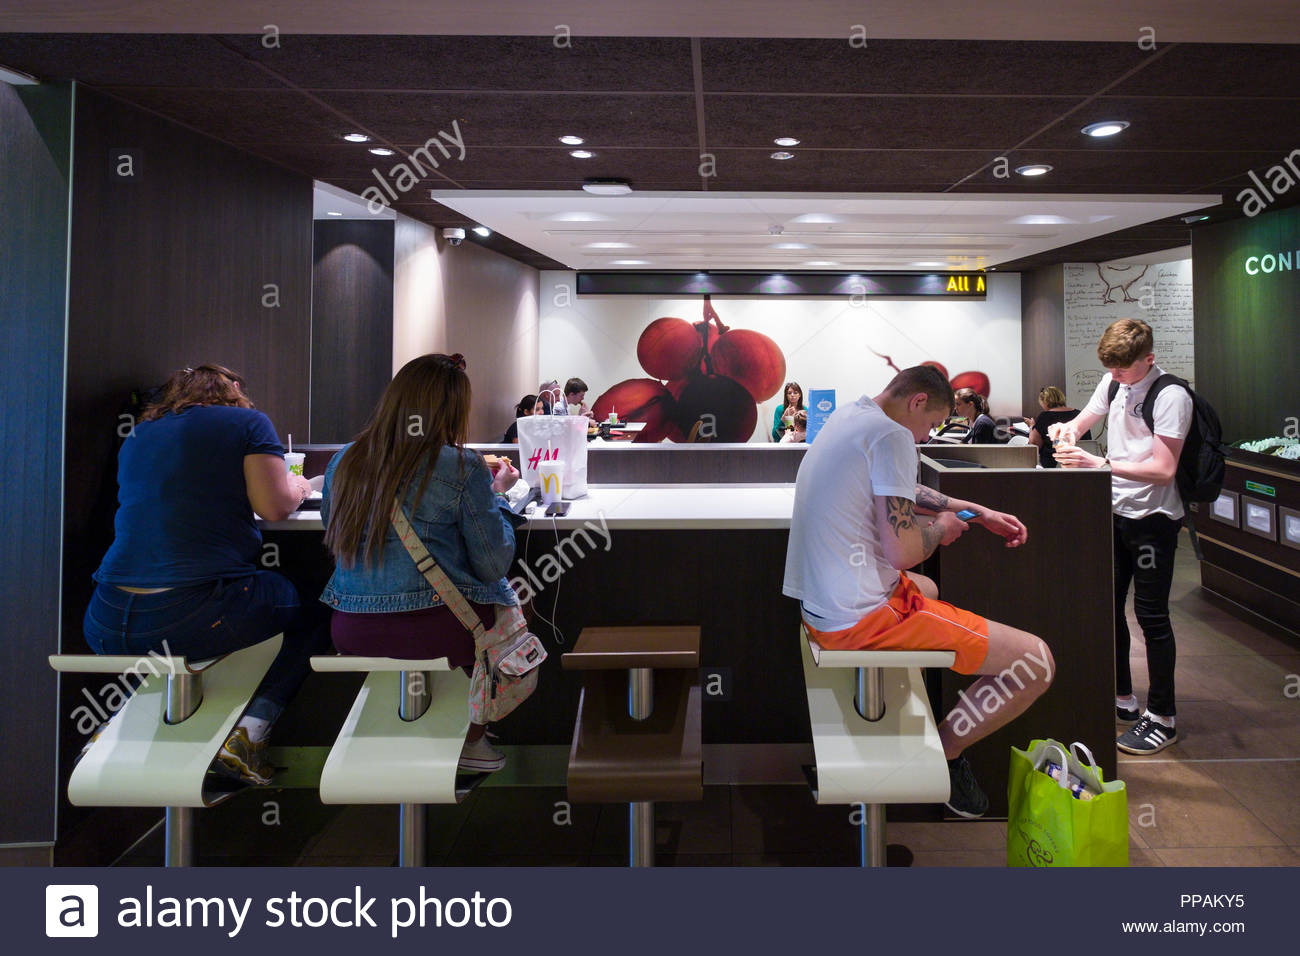 People sitting at counter inside McDonald's fast food restaurant, Grafton Street, Dublin, Leinster, Ireland - Stock Image